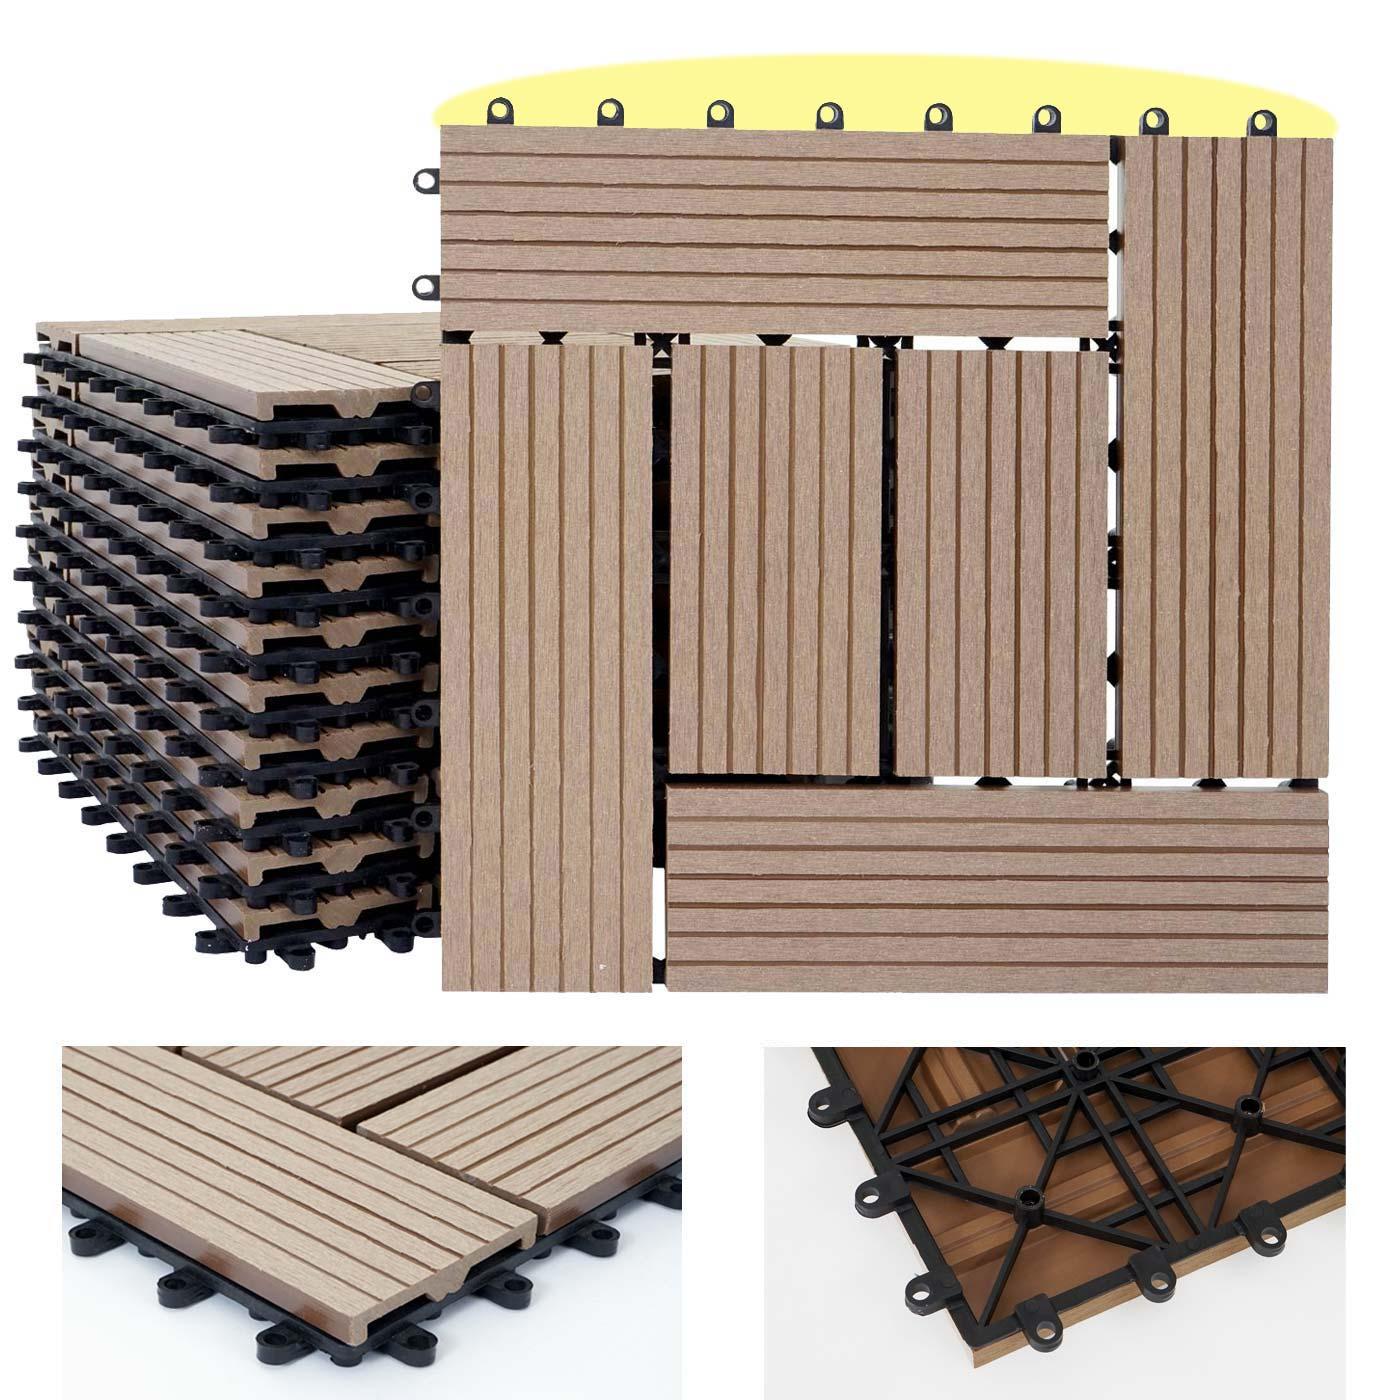 1qm wpc holz fliesen rhone bodenfliesen balkon terrasse 11 st ck je 30x30cm ebay. Black Bedroom Furniture Sets. Home Design Ideas